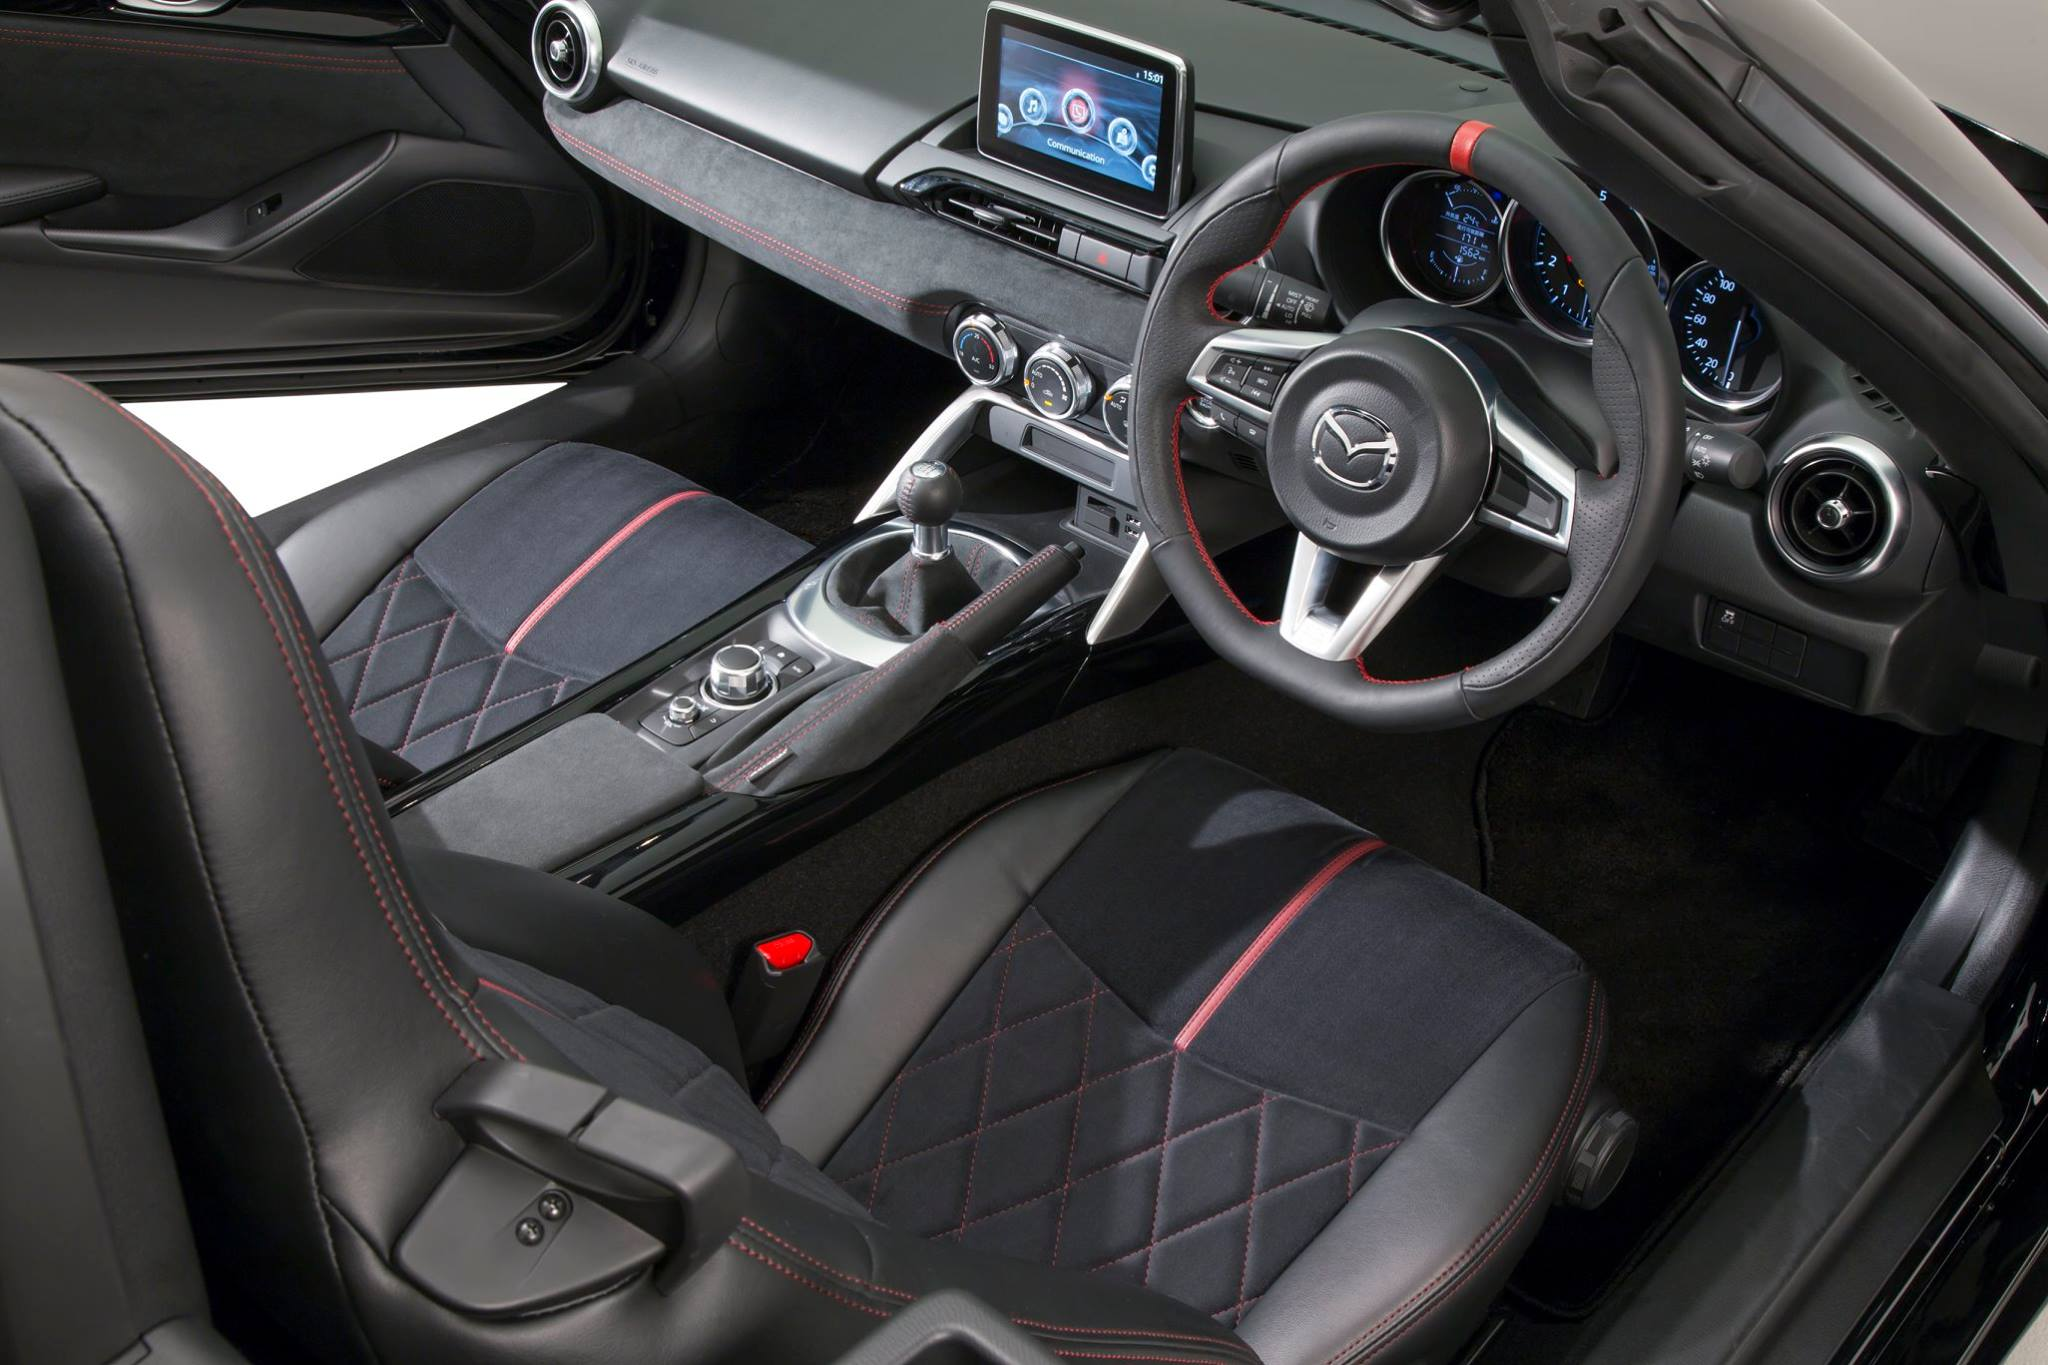 Mazda Mx 5 News 2017 Rf Version Revealed Page 16 17 Miata Engine Plastic Skirt Diagram Acurazine Acura Enthusiast Community